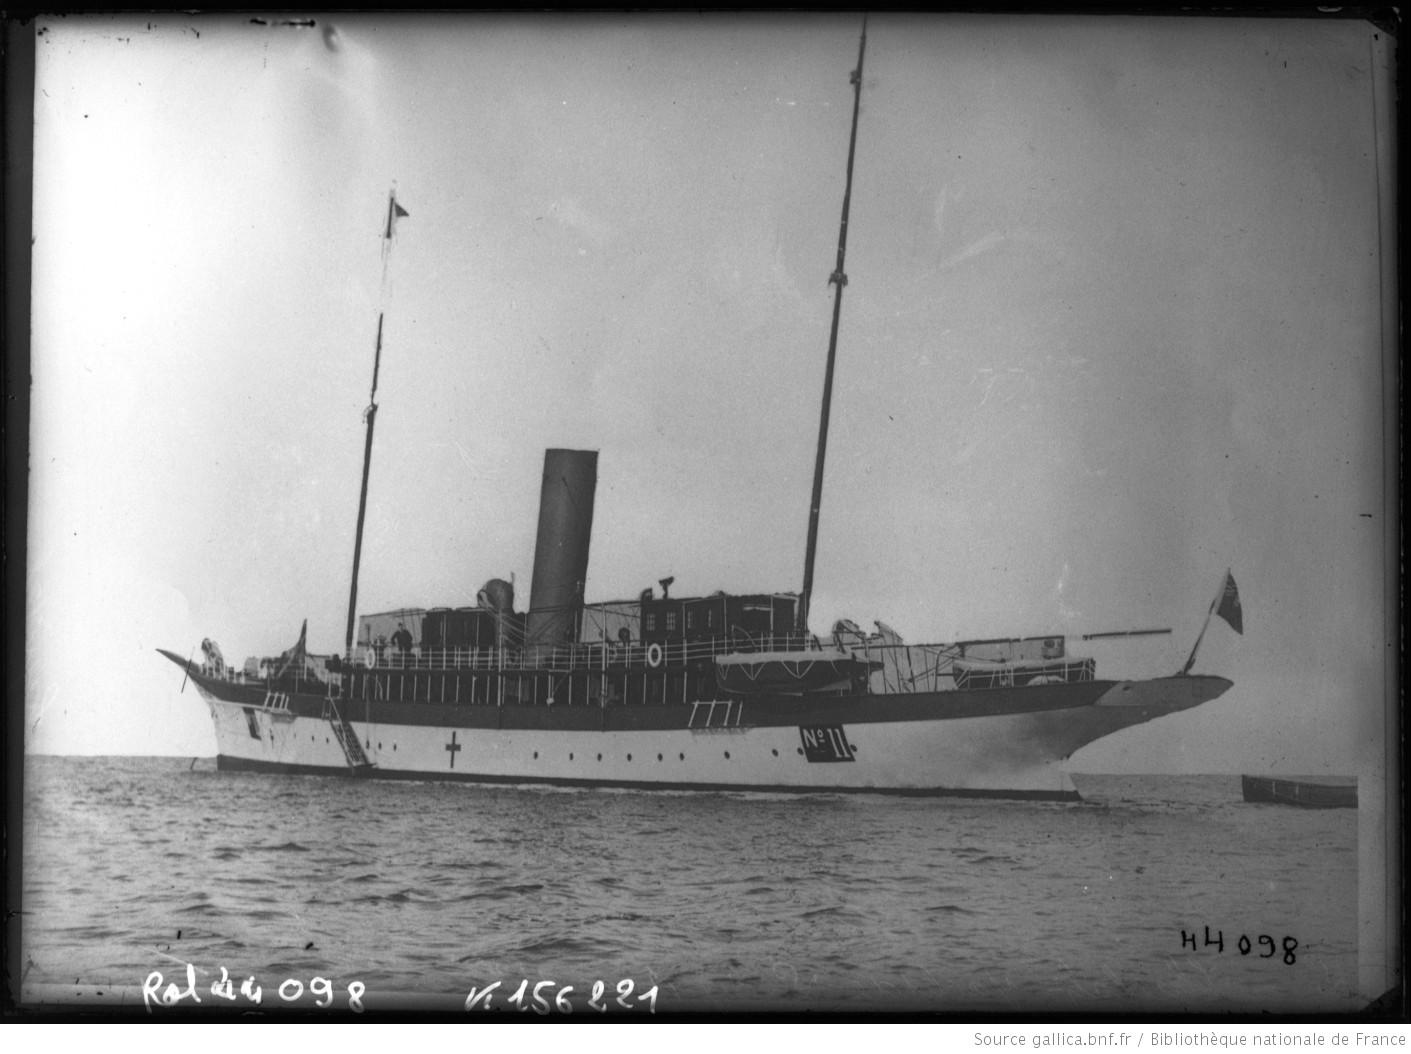 Sheelah as a hospital ship